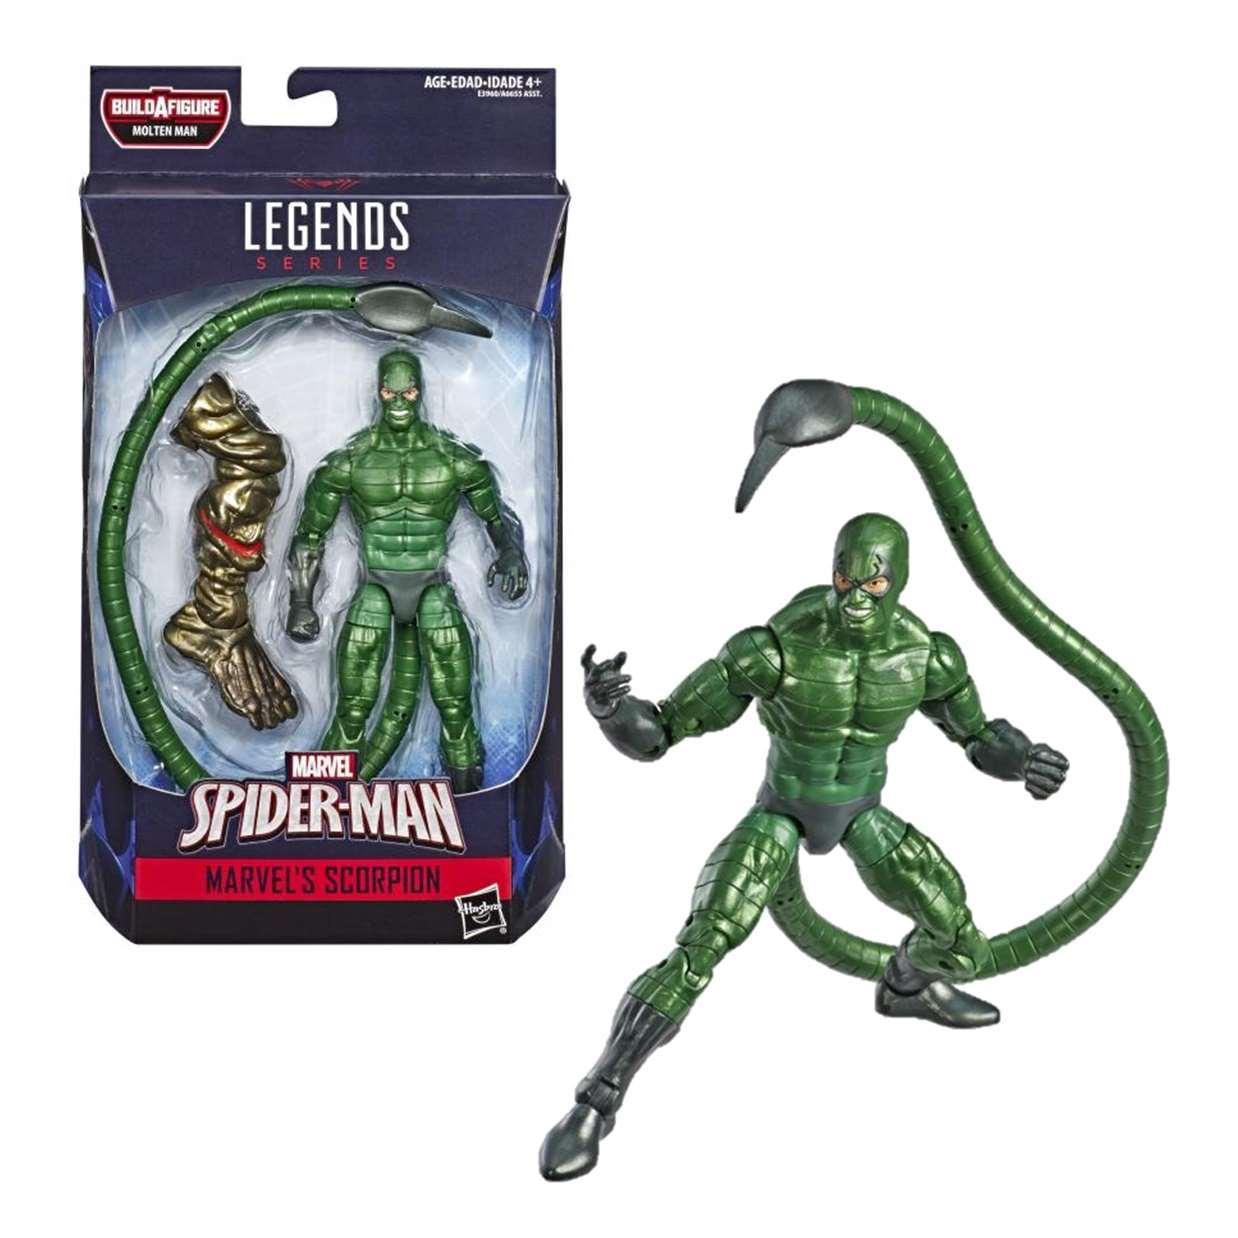 Scorpion Figura Far From Home B A F Molten Man Legends